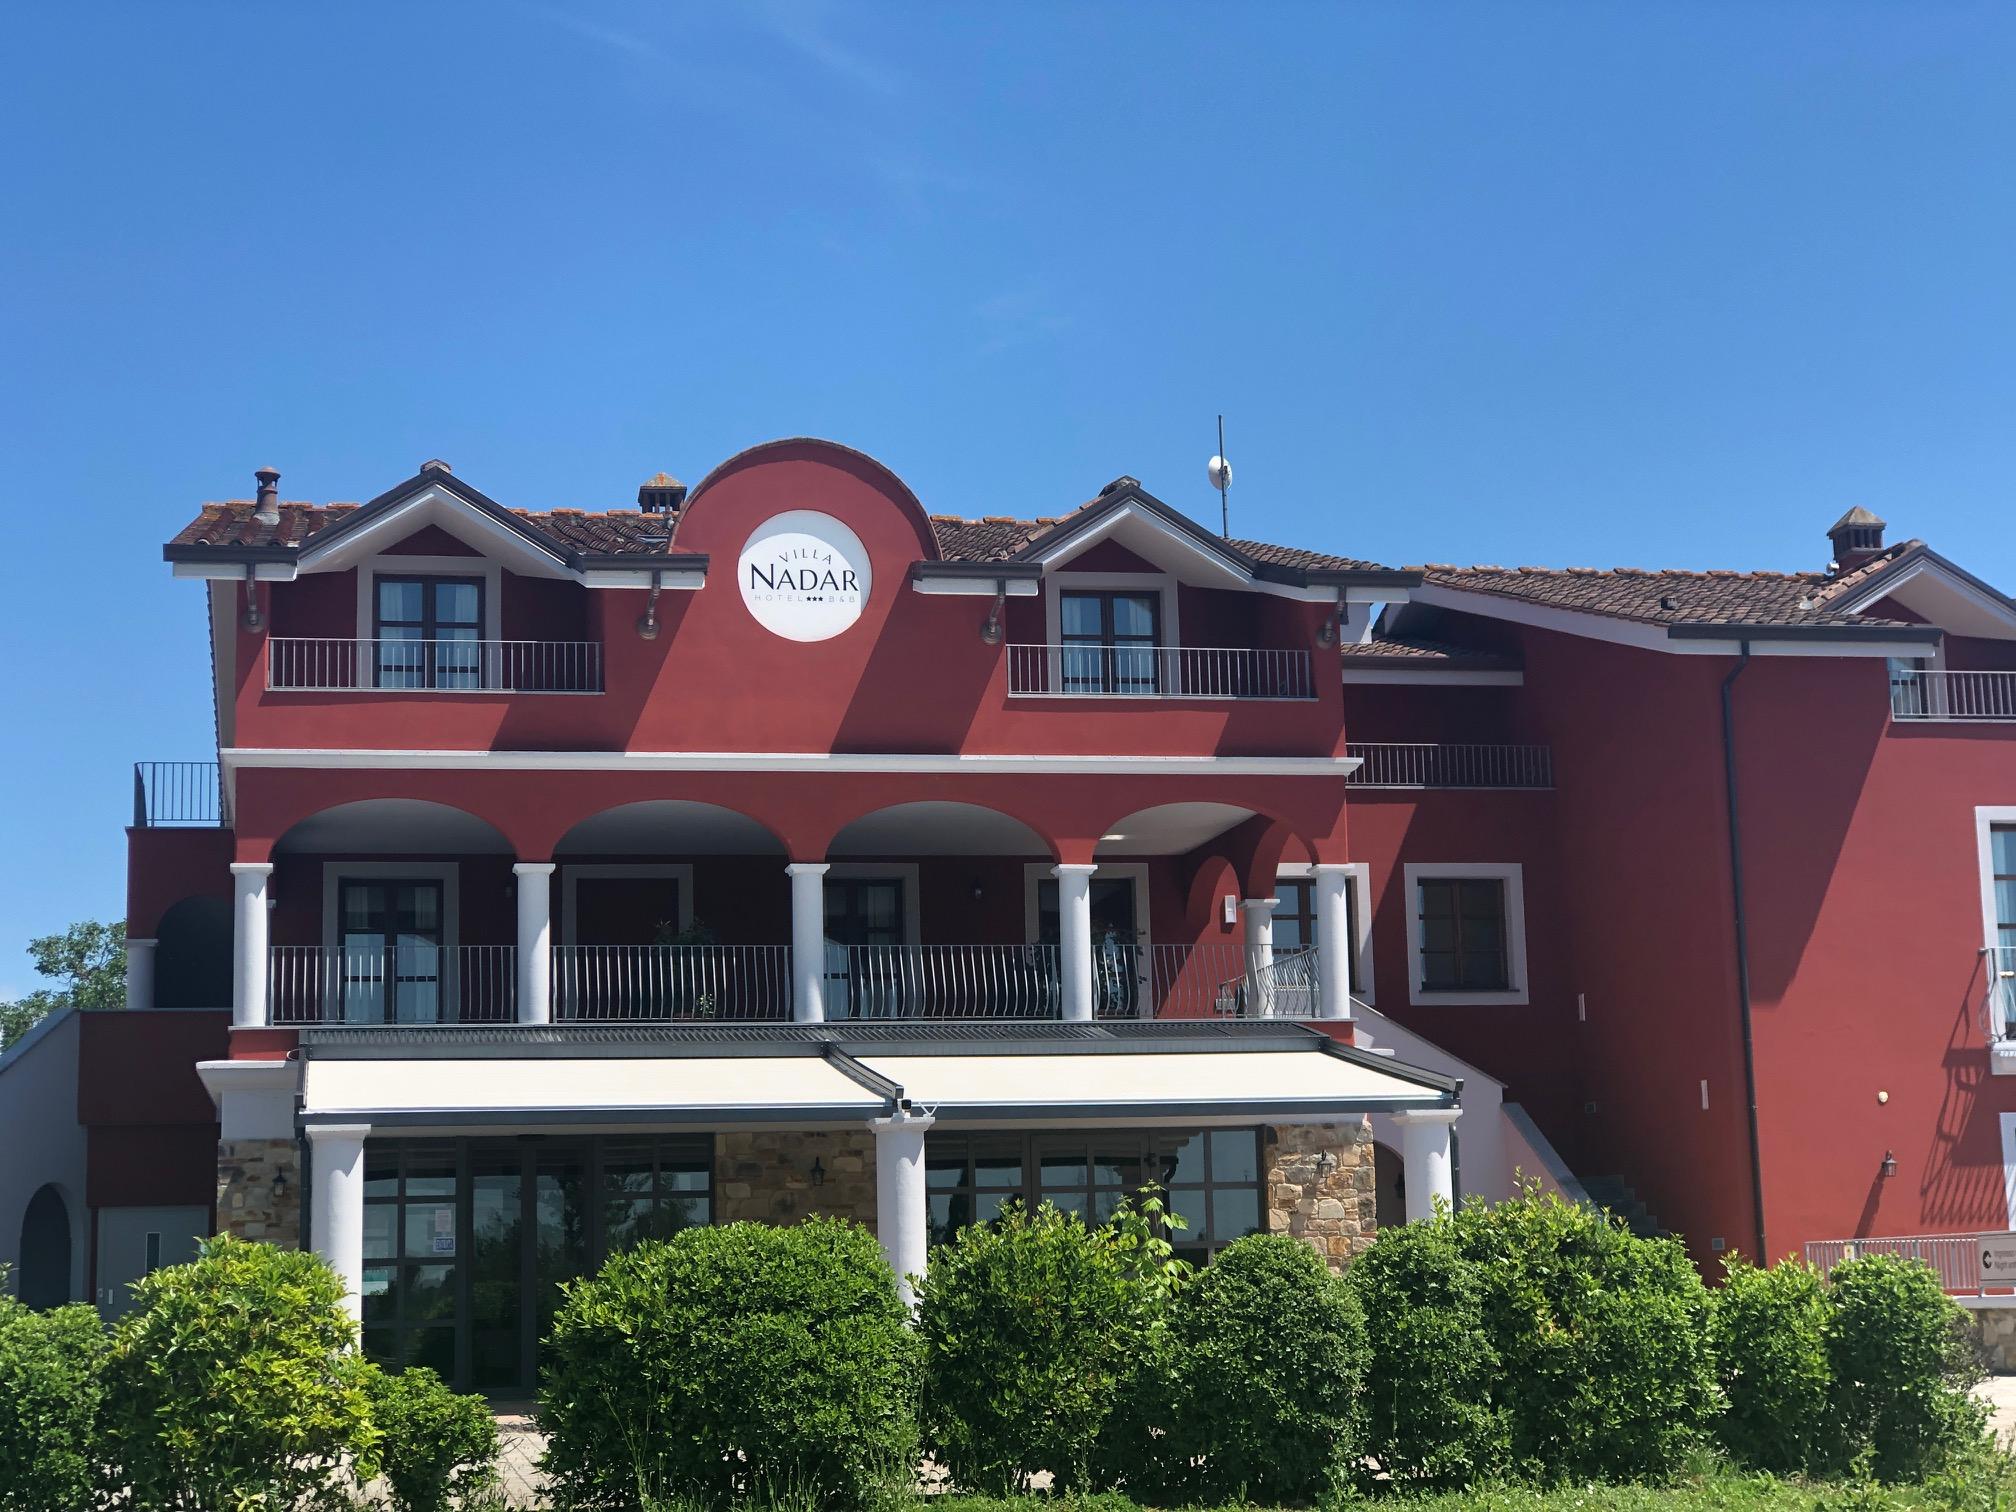 Foto Villa Nadar Hotel *** B&B